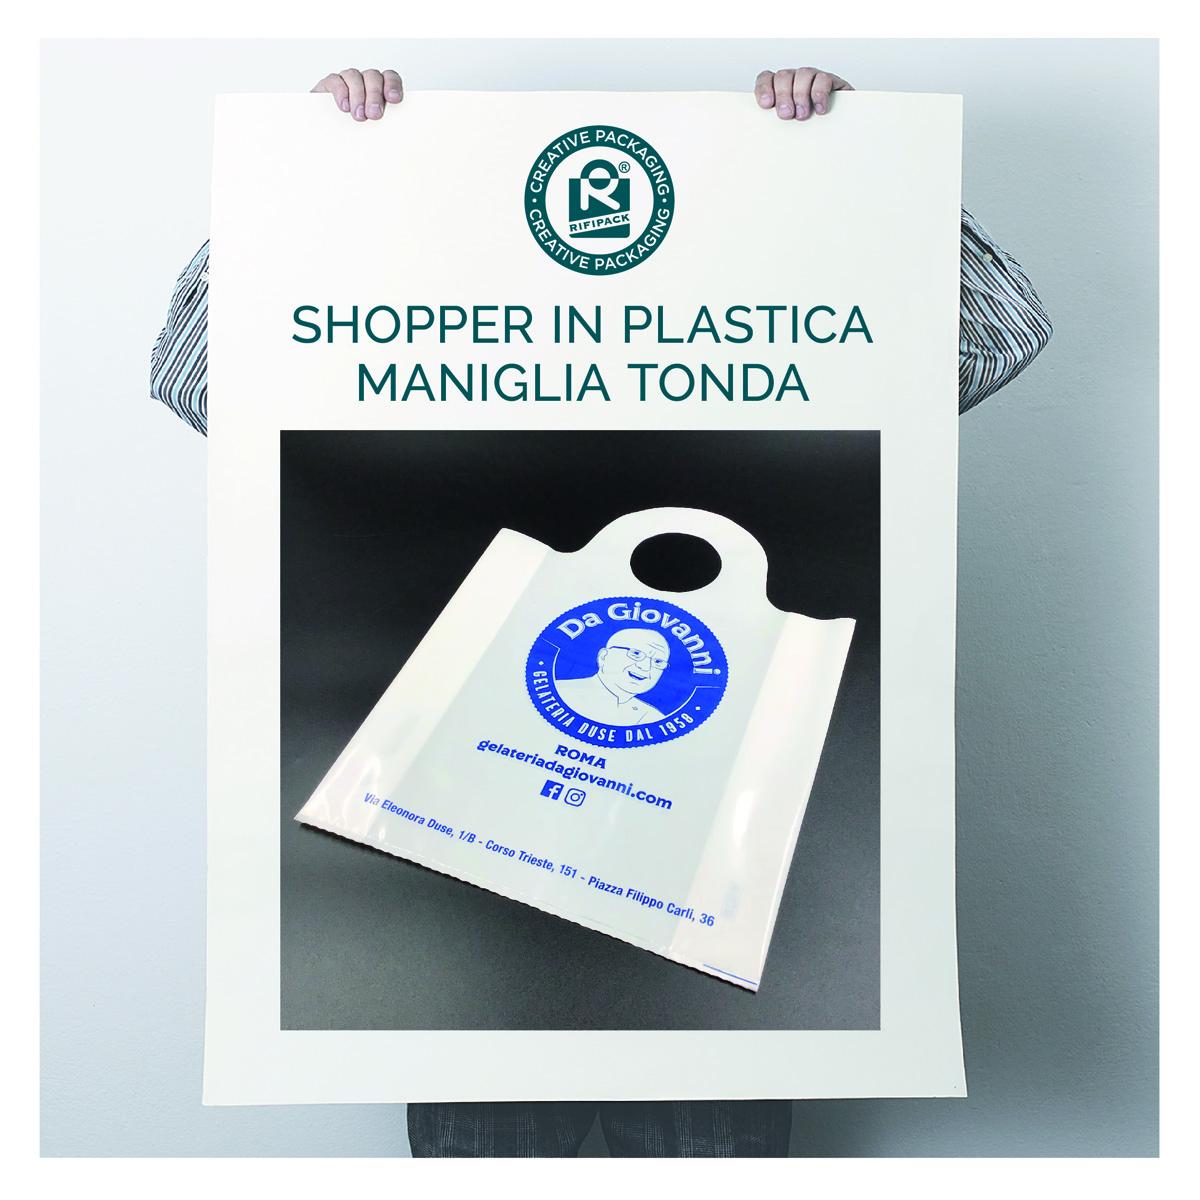 rifipack-shopper-in-plastica-maniglia-a-borsetta-tonda-1